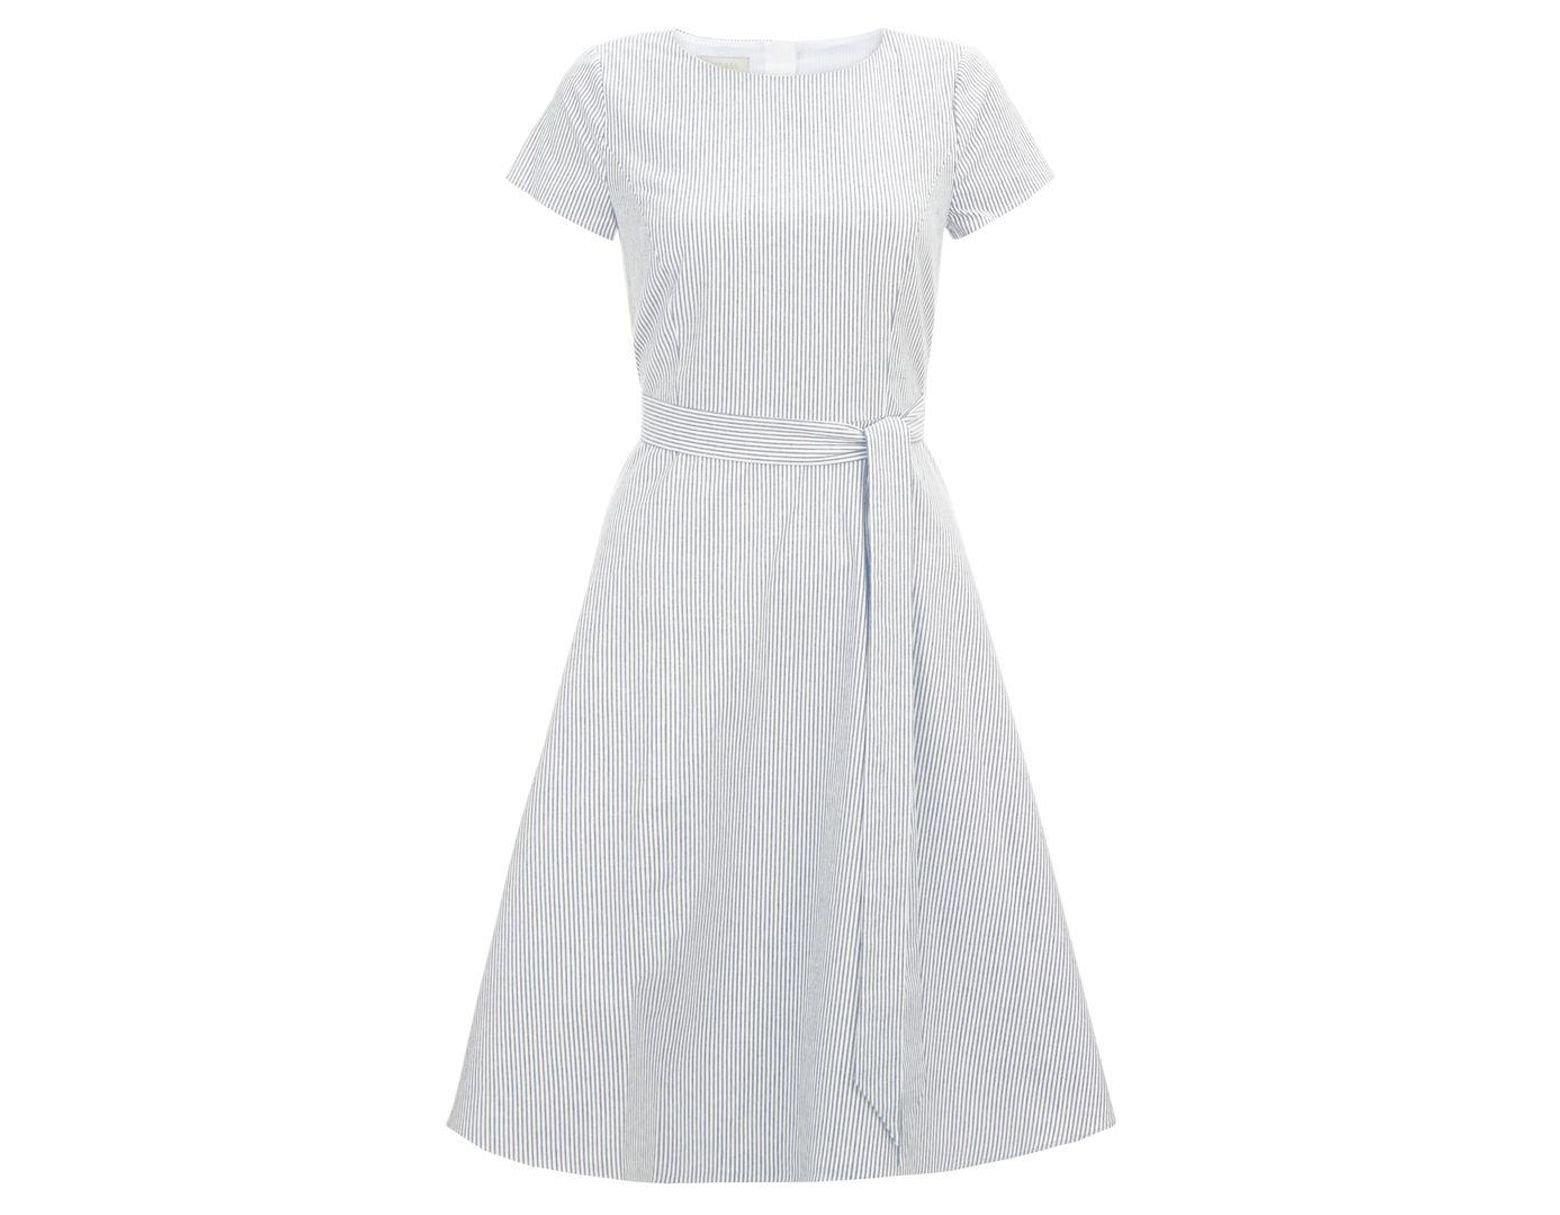 530f784ecc0b7 Hobbs Danielle Dress in White - Lyst